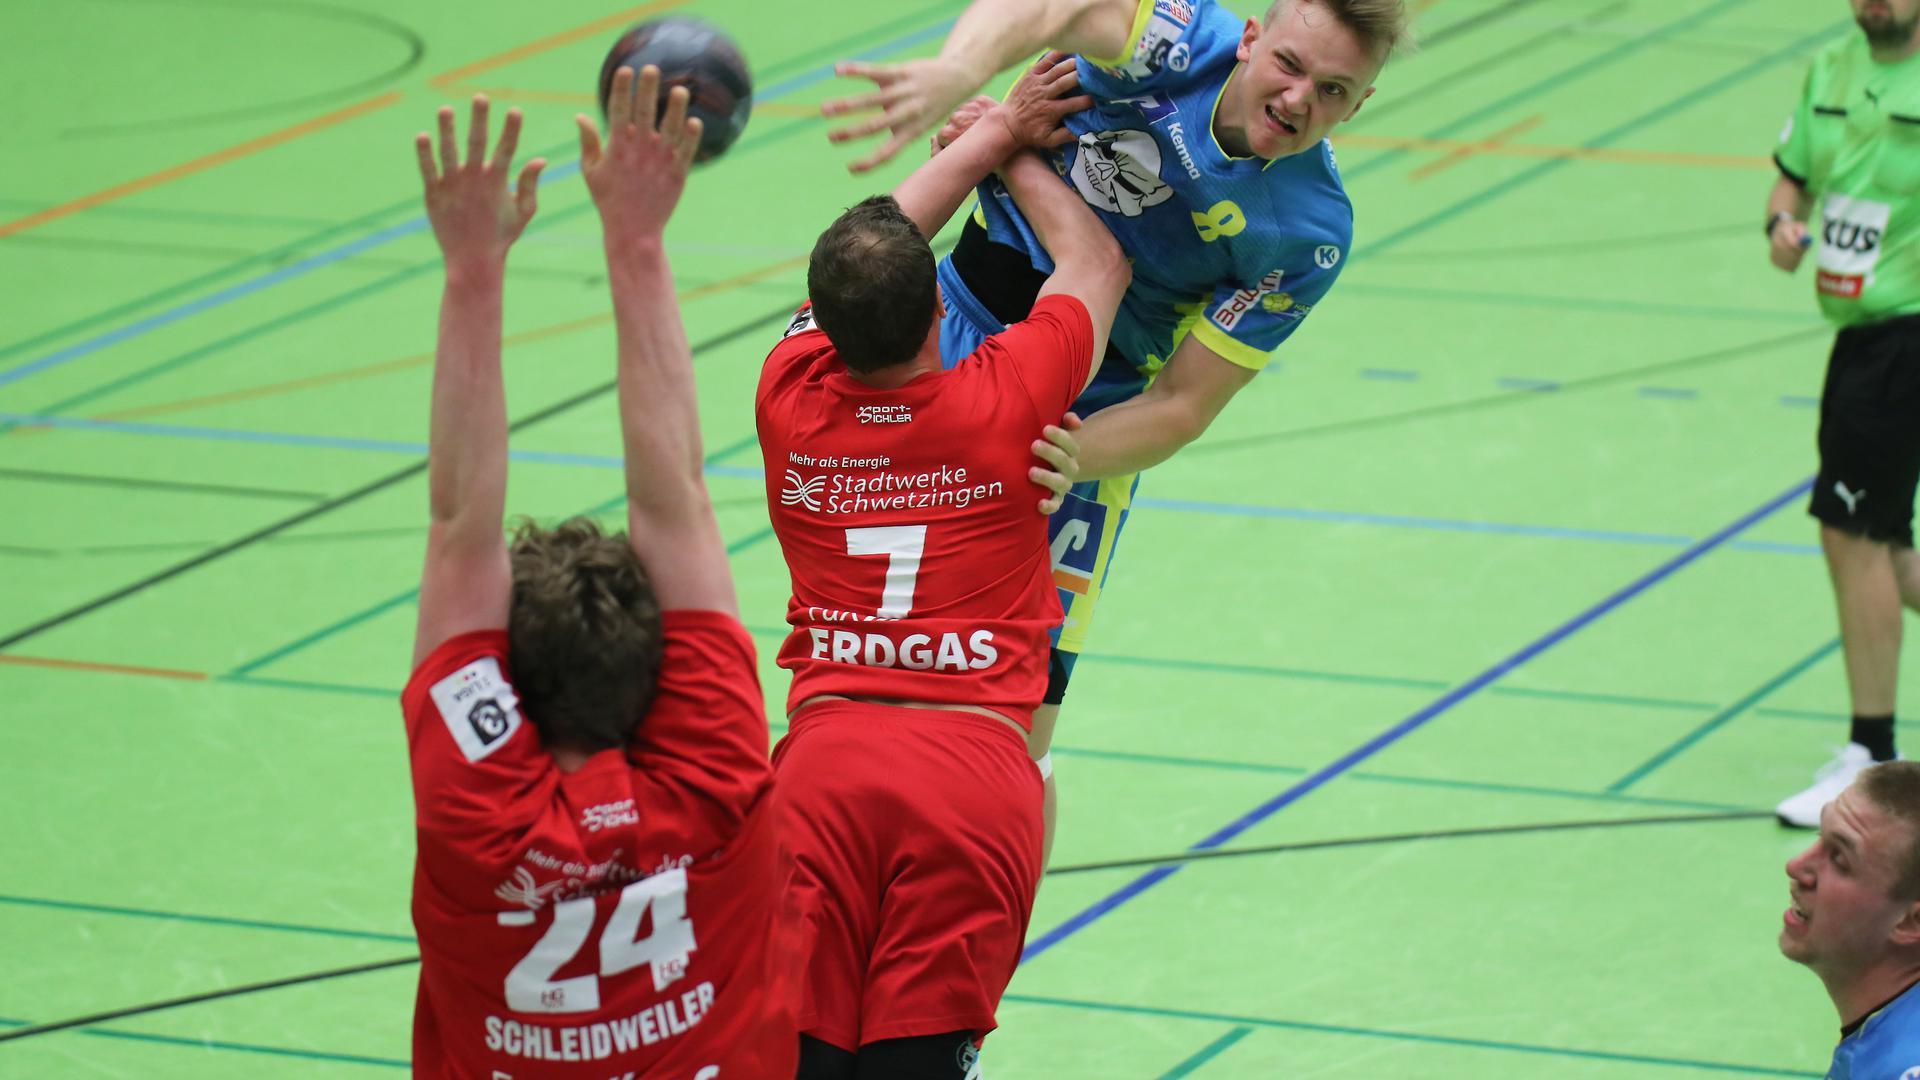 Schöttle Nico SG Pf Eutingen blau_Schleidweiler Bastian24_Wahl Christian7 beide HG OSchw. rot